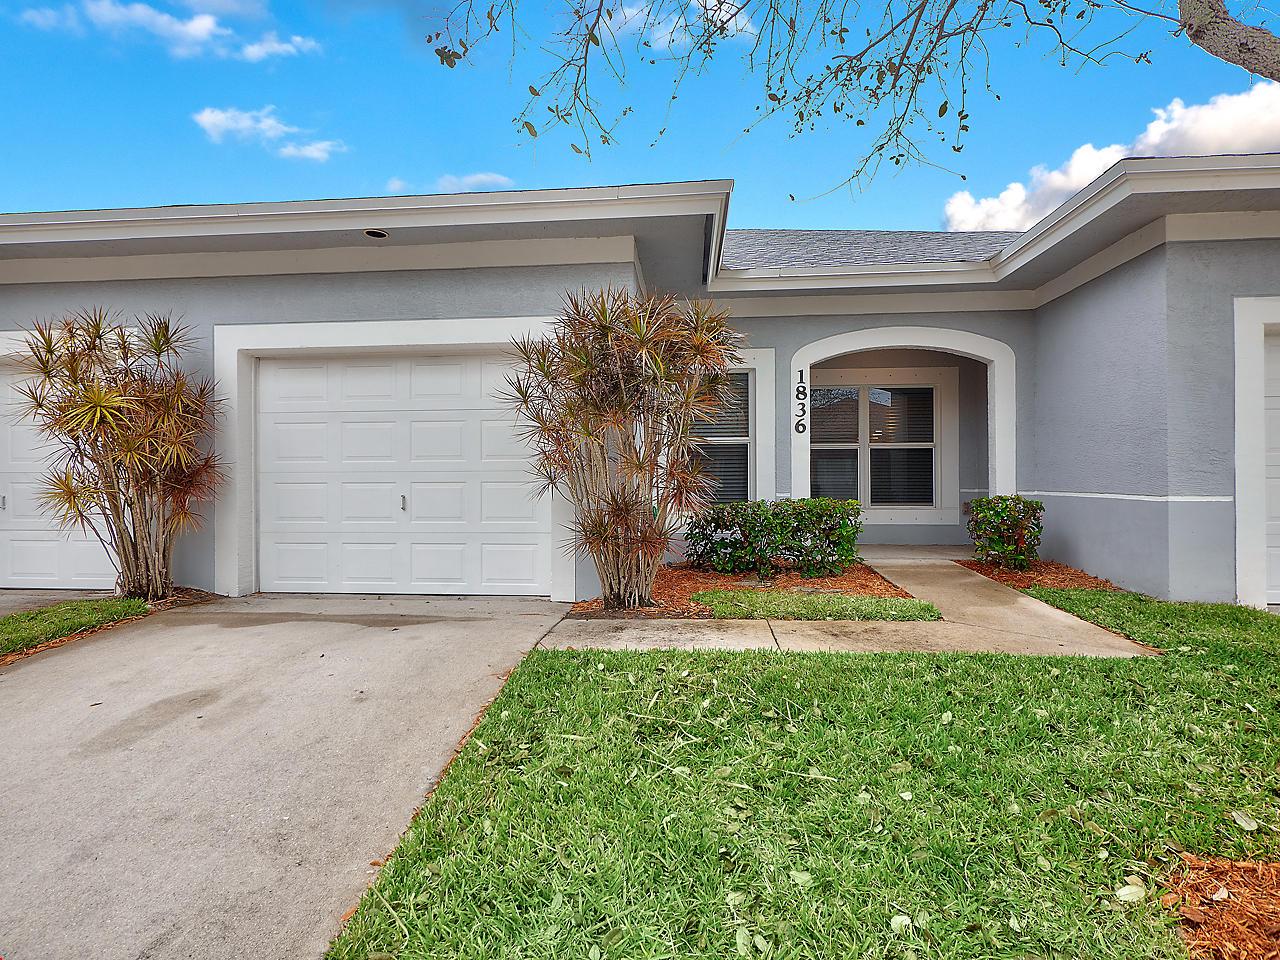 1836 Pelican Drive, Fort Pierce, FL 34982